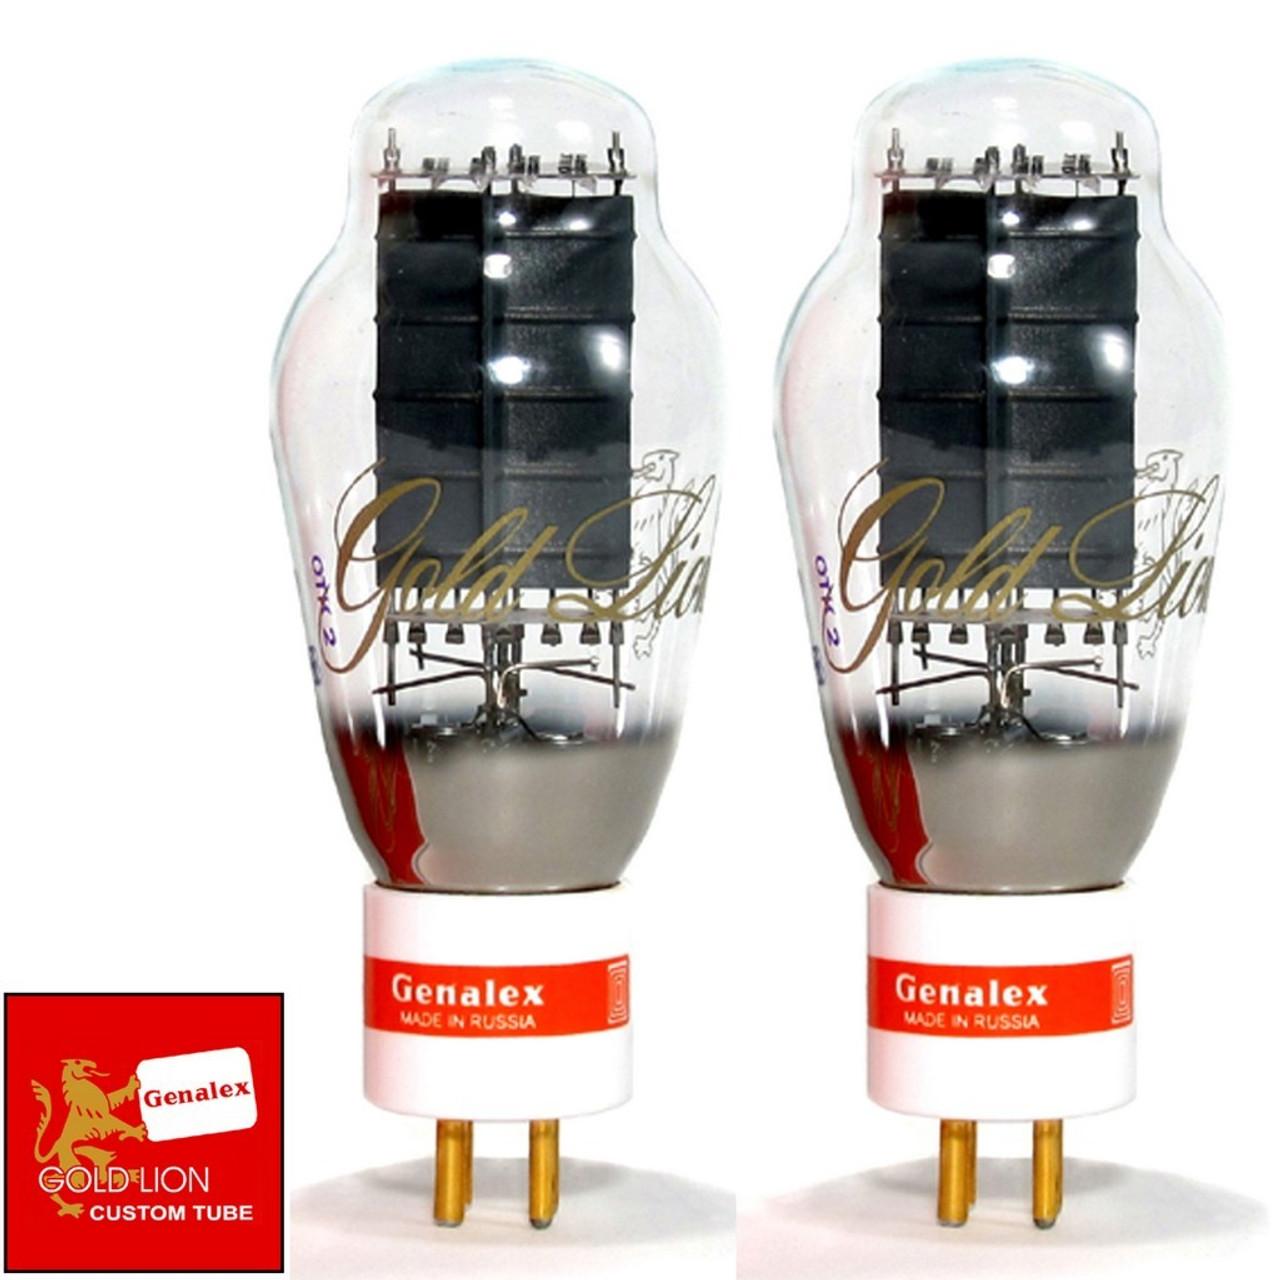 Psvane 300B HiFi Series Vacuum Tubes Gold Pins 4 New Current Matched Quad